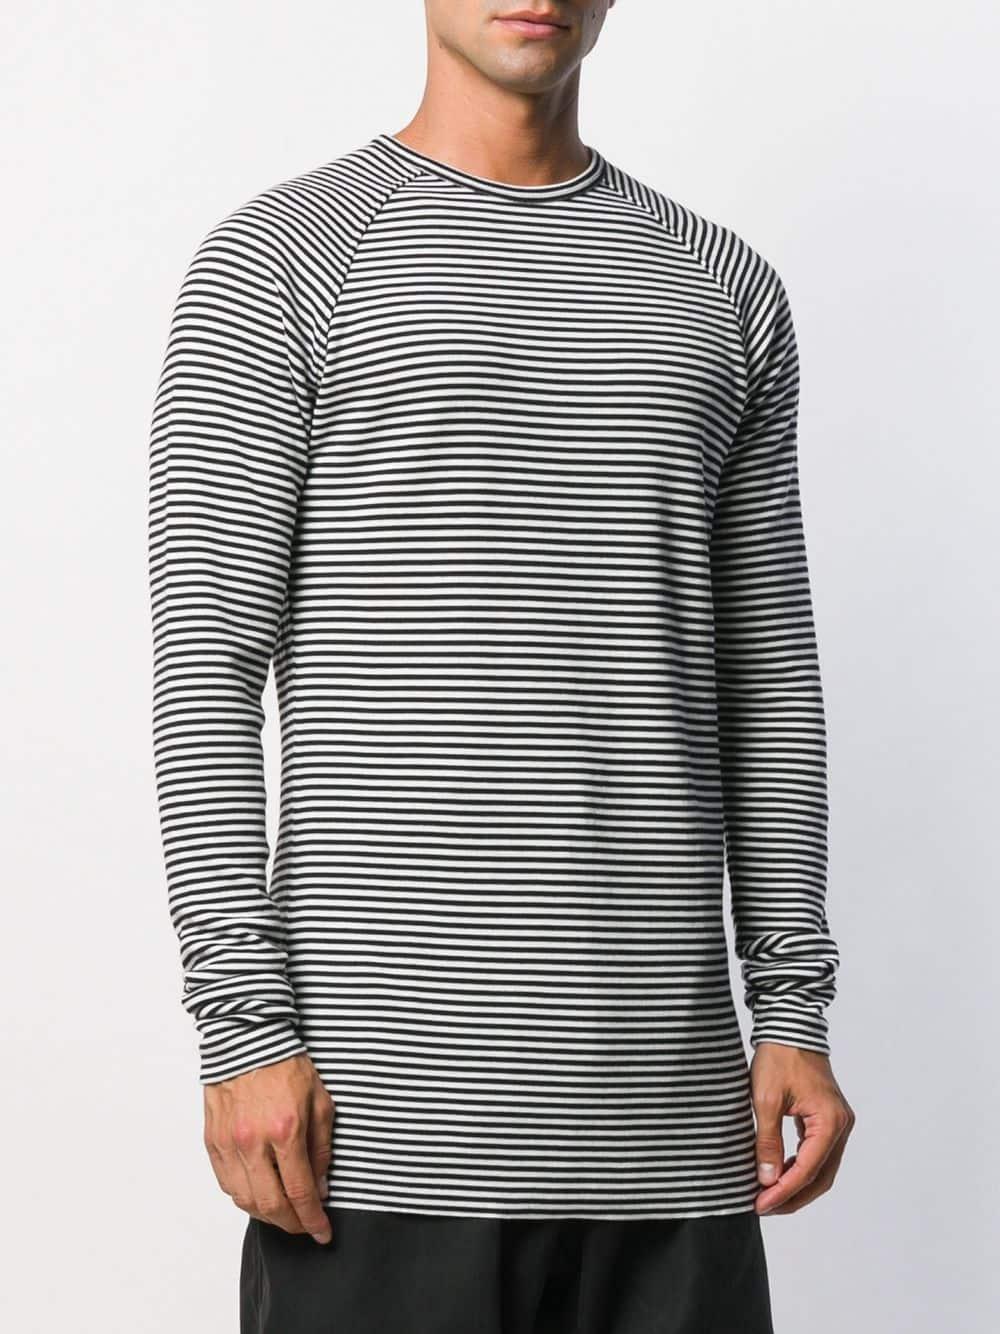 Haider Ackermann Wol Gestreepte Sweater in het Wit voor heren